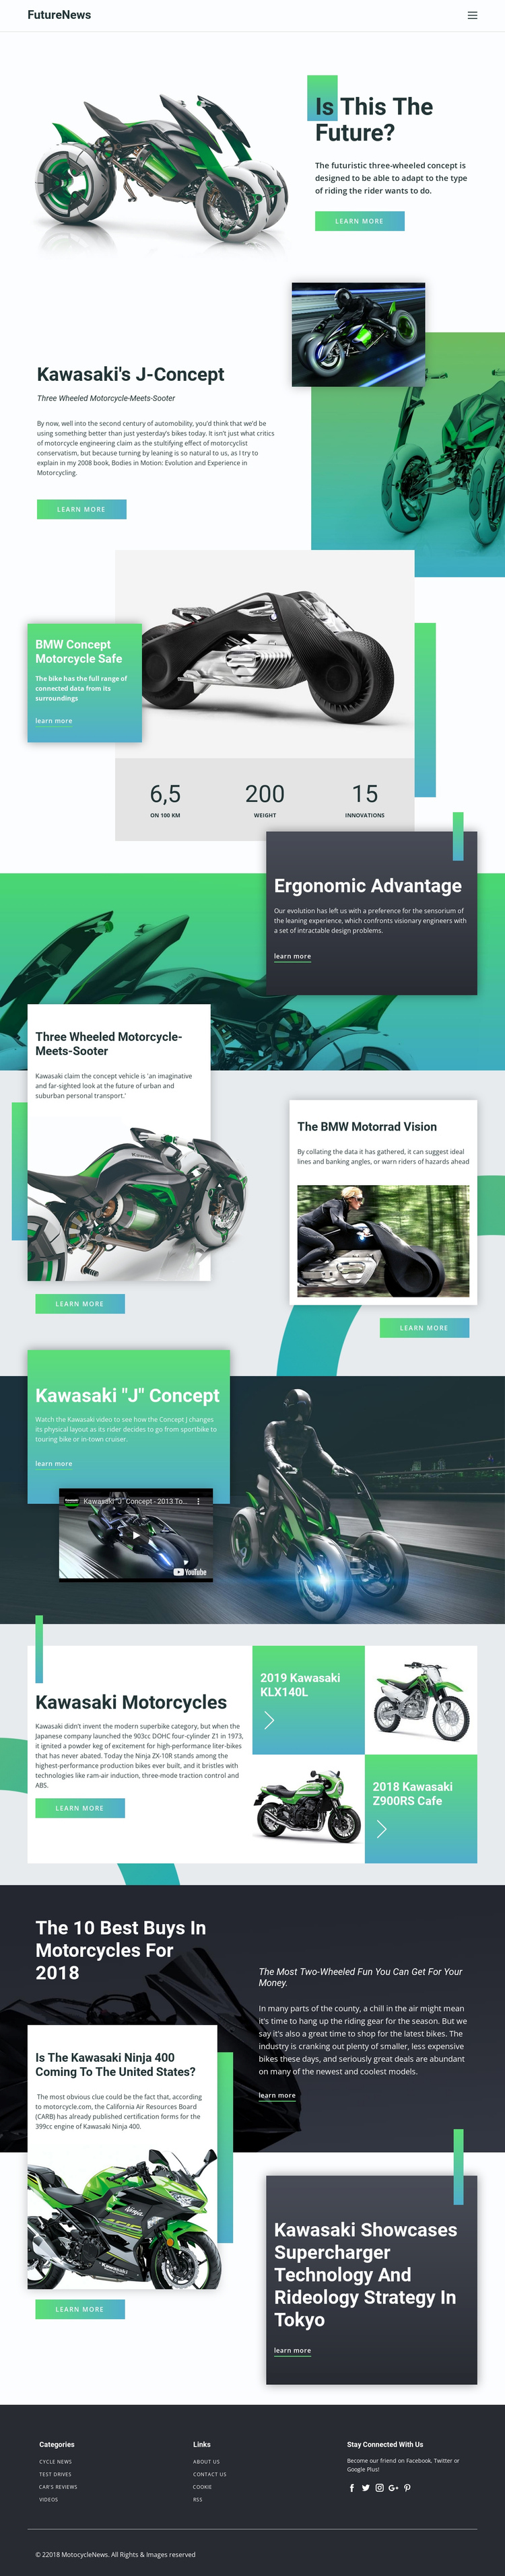 Future News Website Builder Software